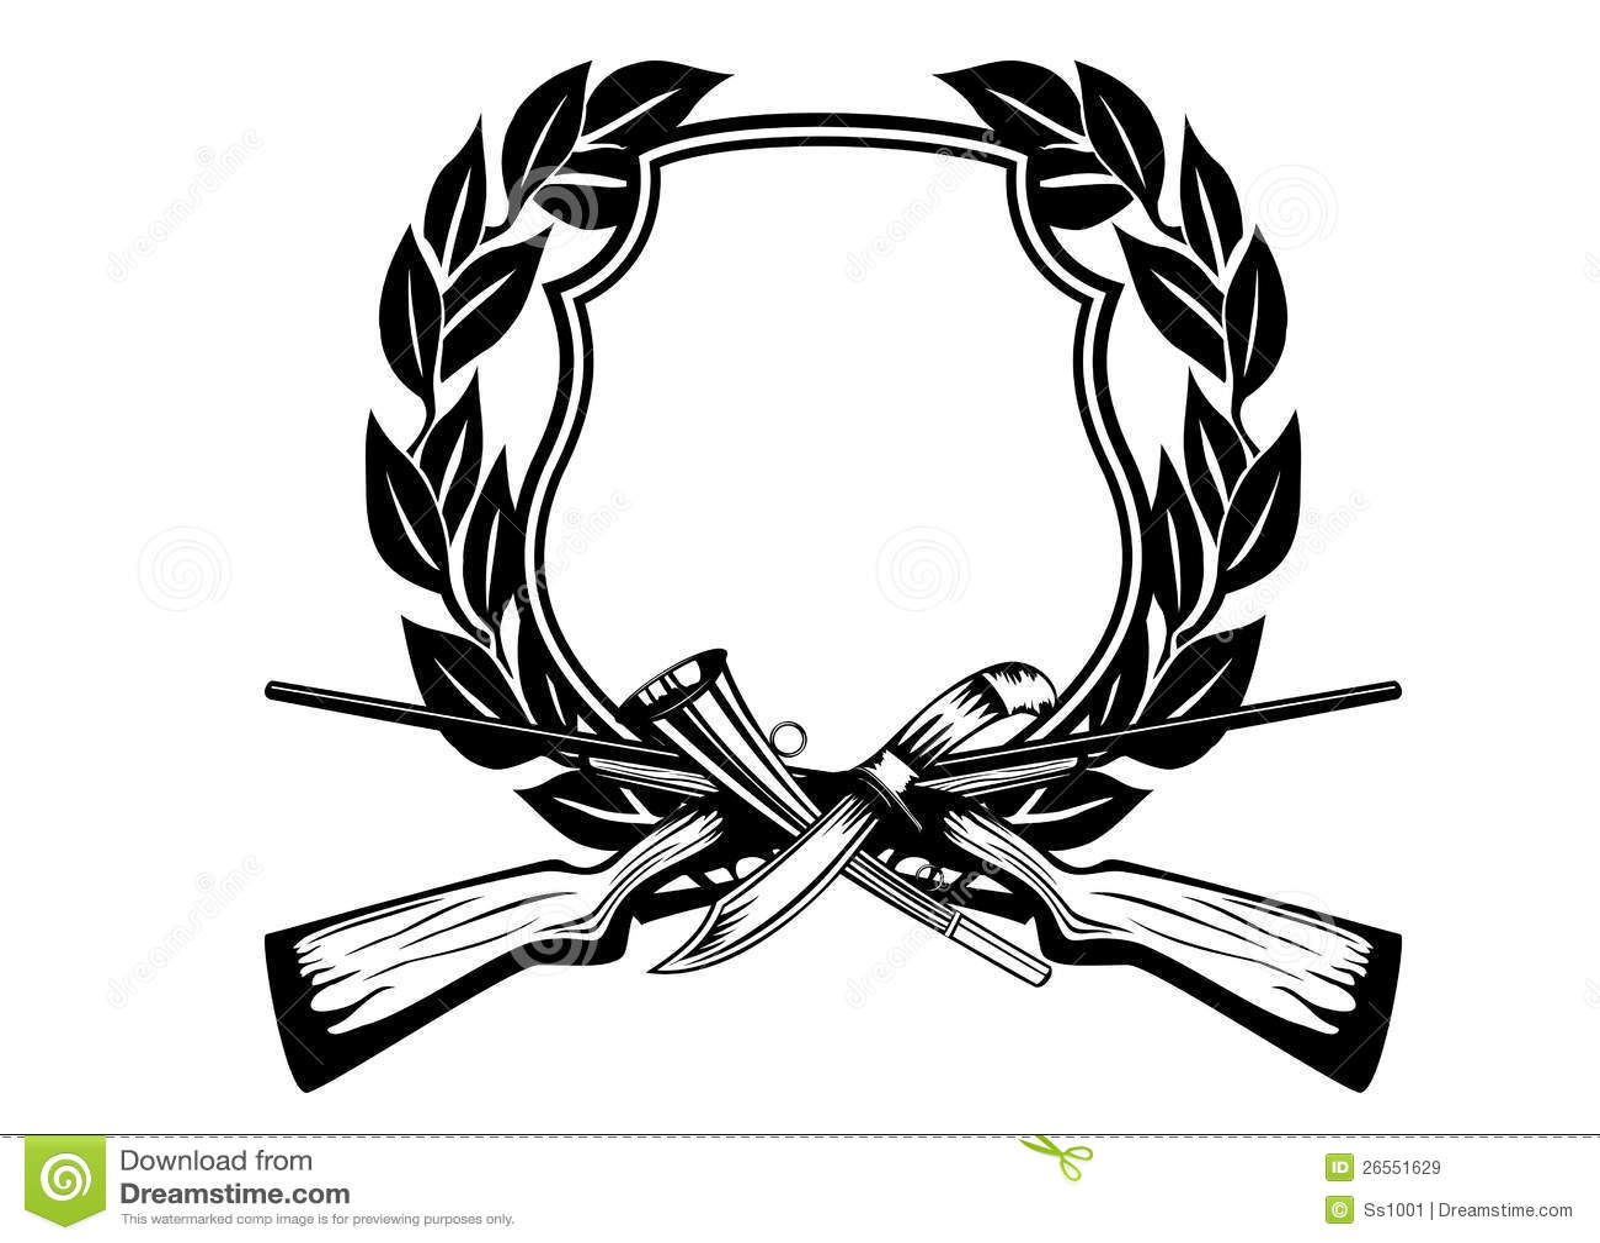 Frame hunting stock vector. Illustration of hunt, garland - 26551629